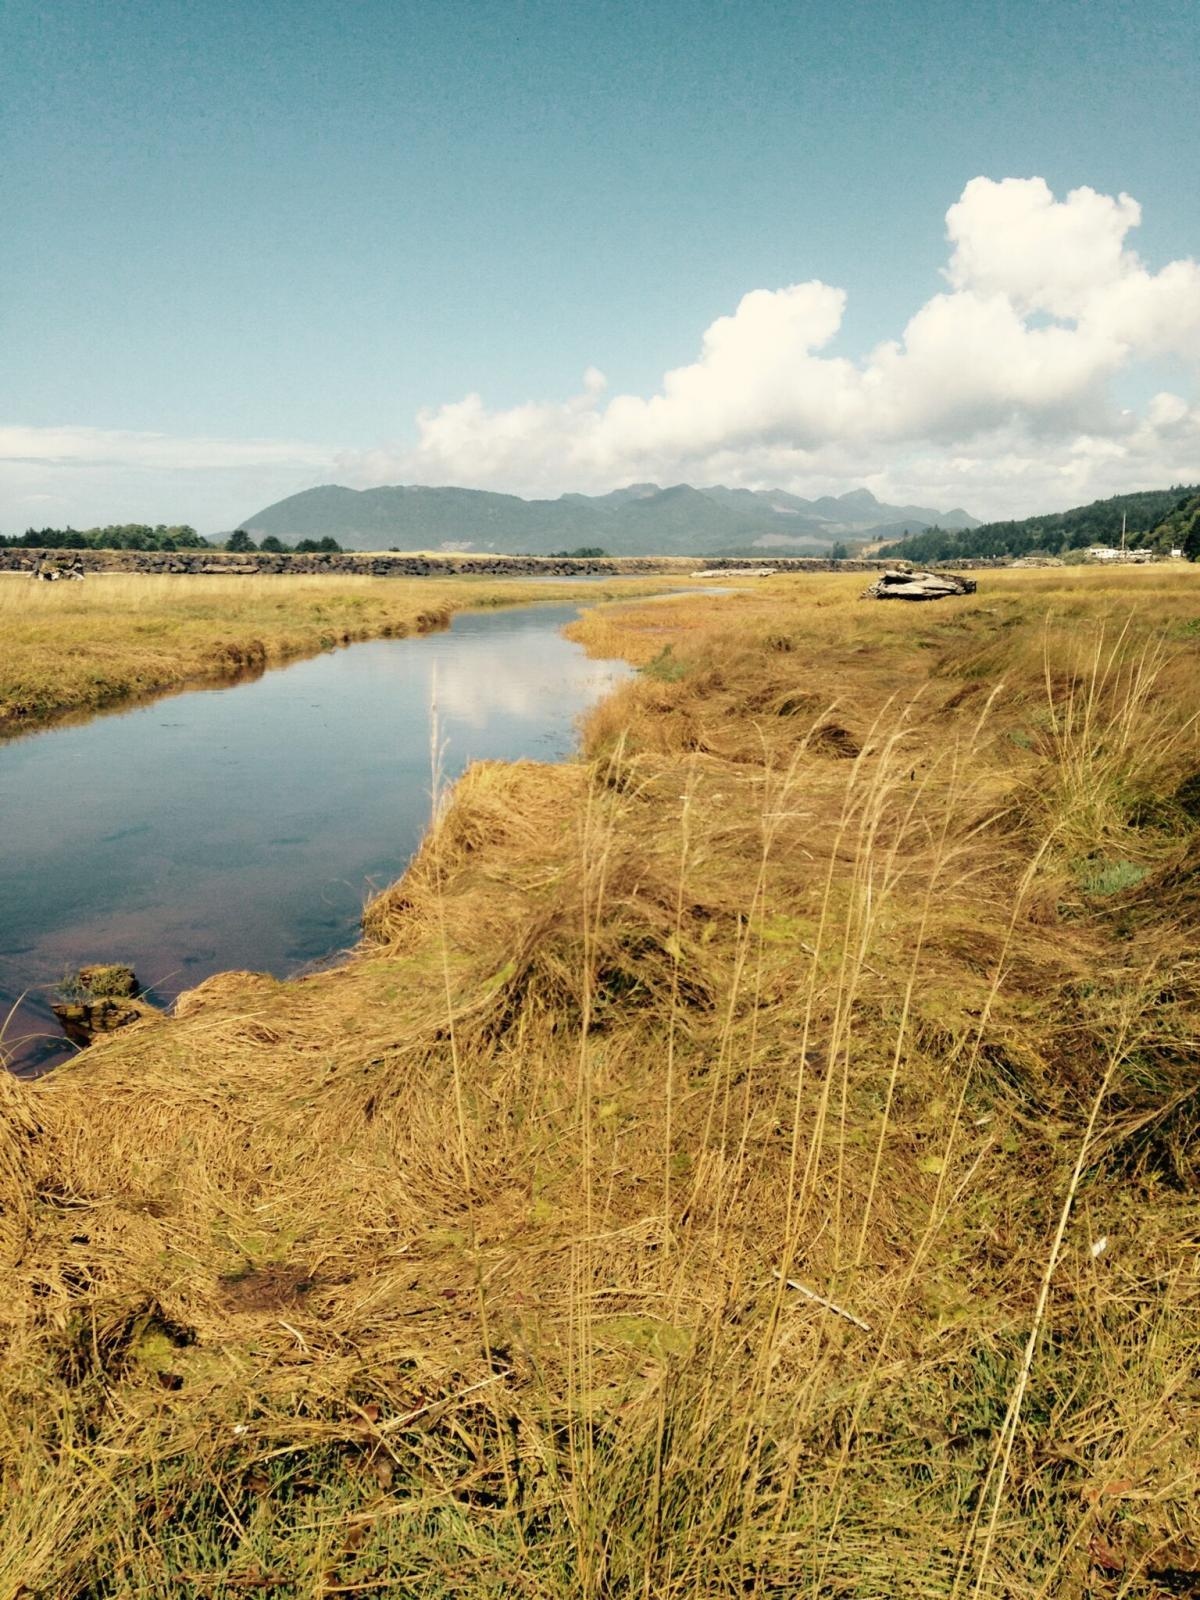 Marsh at the Nehalem River south jetty. | Photo by Allison Asbjornsen.